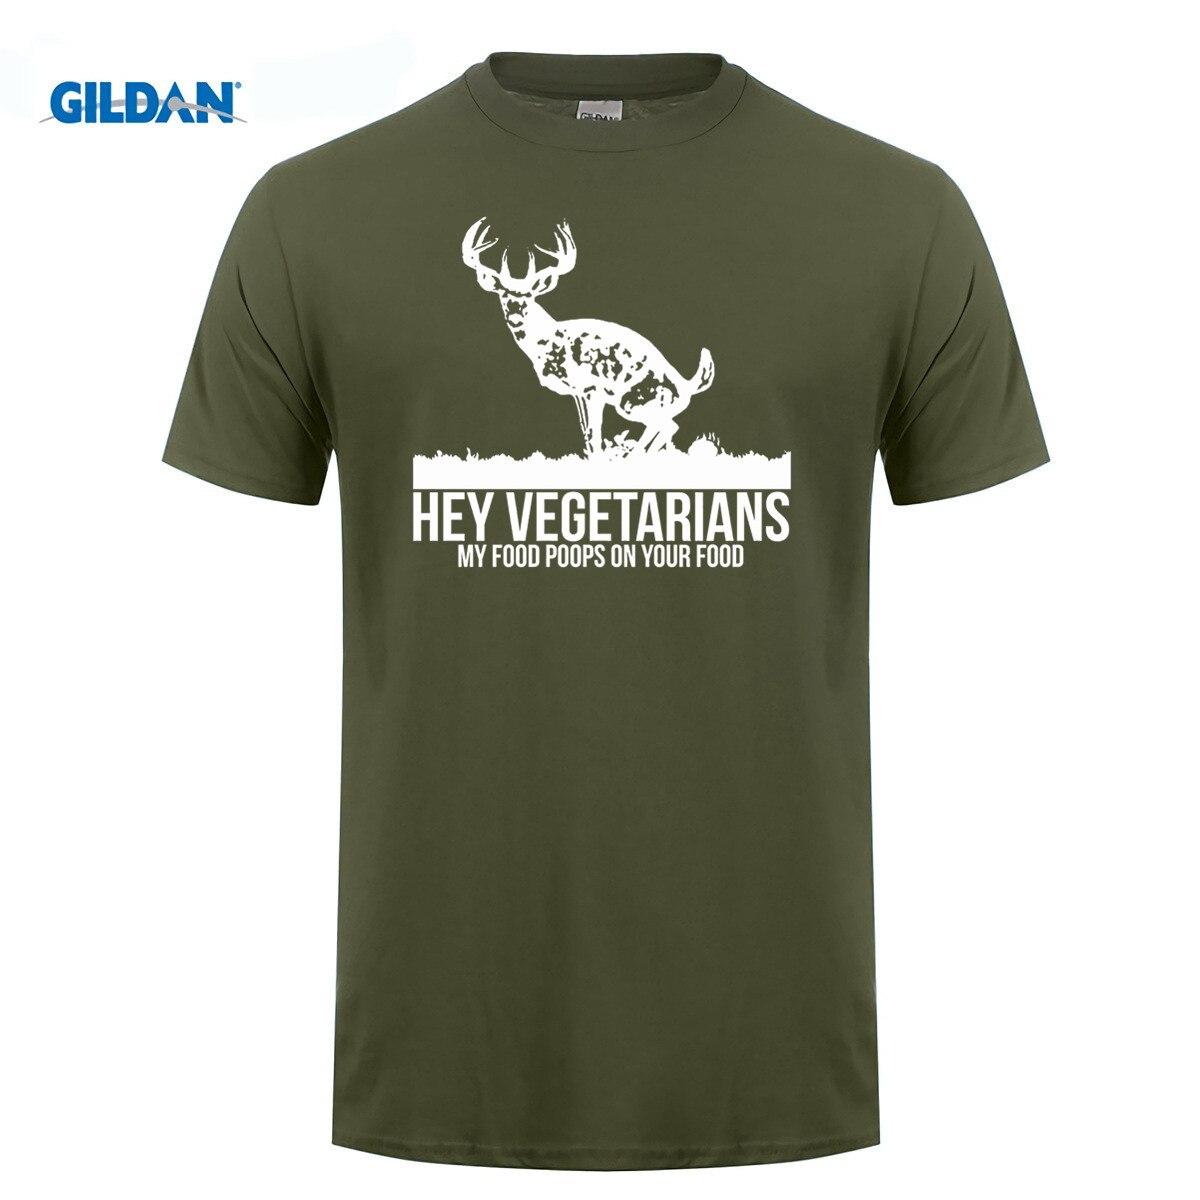 GILDAN Hey Vegetarians My food poops on your food deer t-shirt hunt